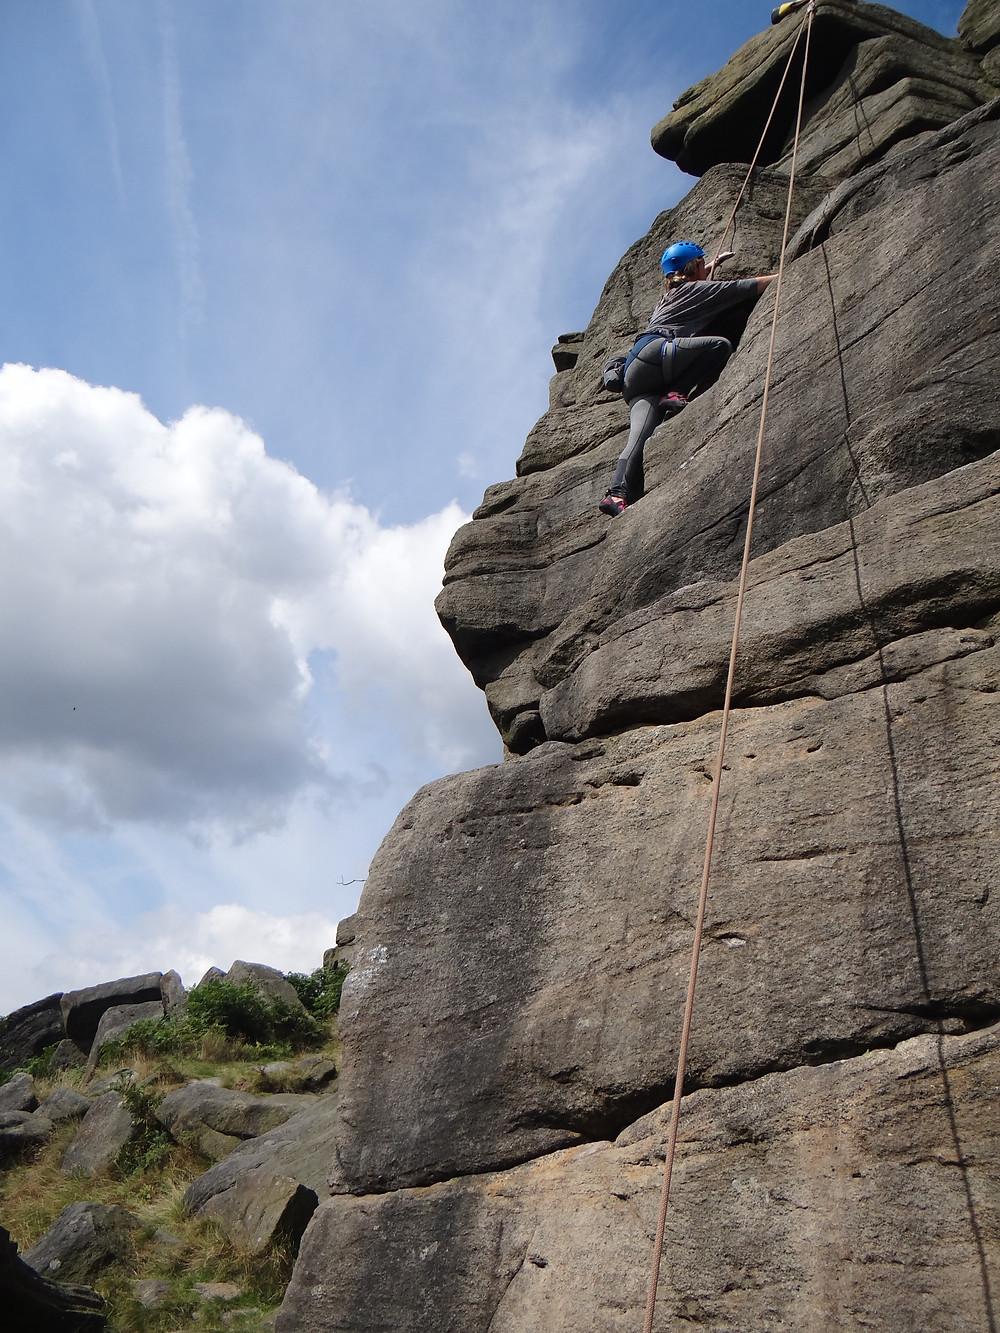 Come rock climbing in the Peak